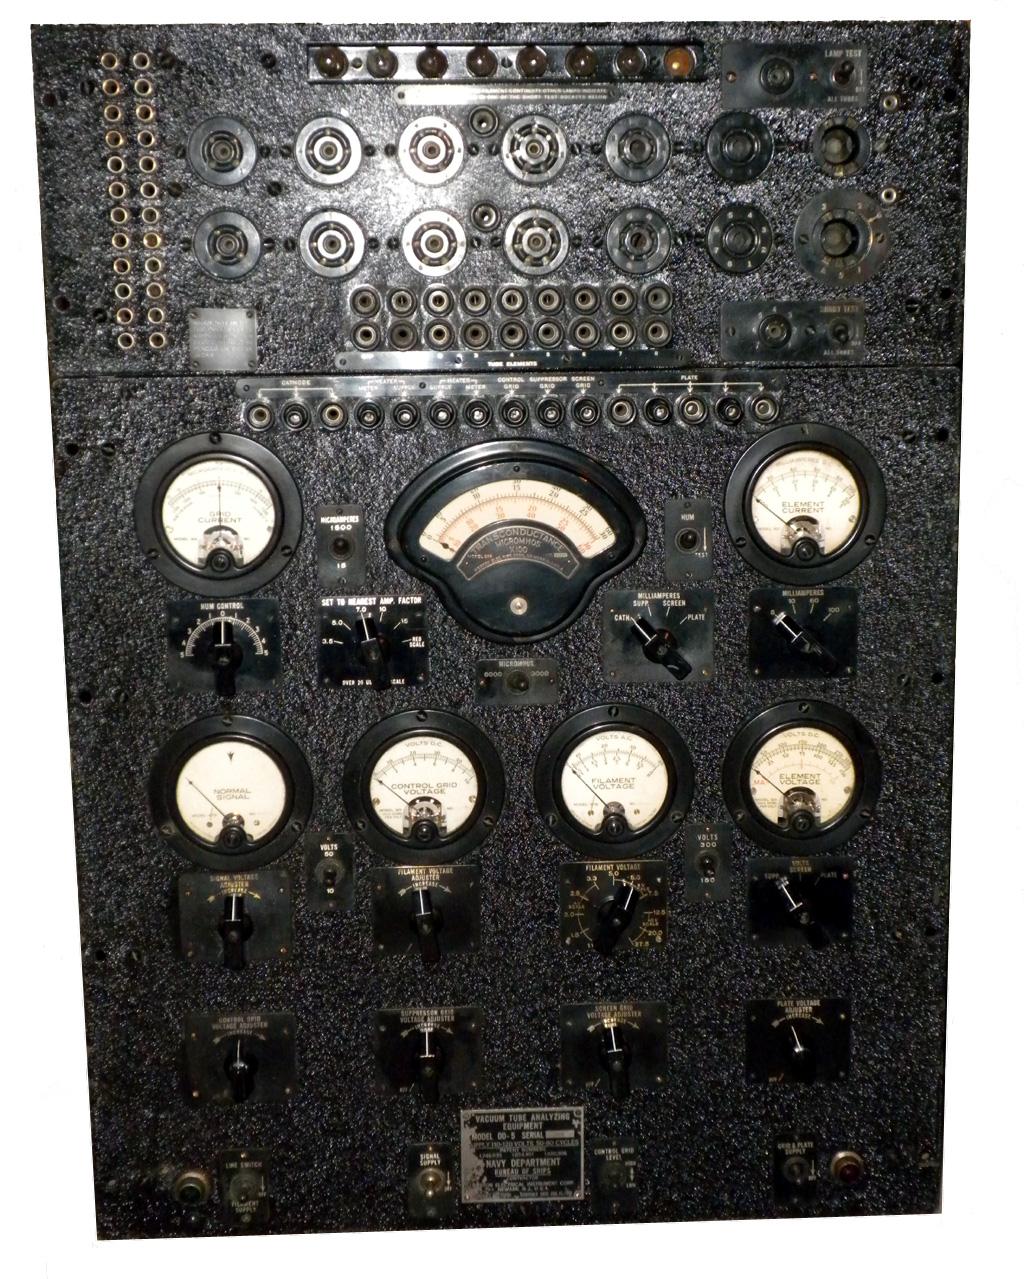 Amazoncom: Classic Heathkit Electronic Test Equipment